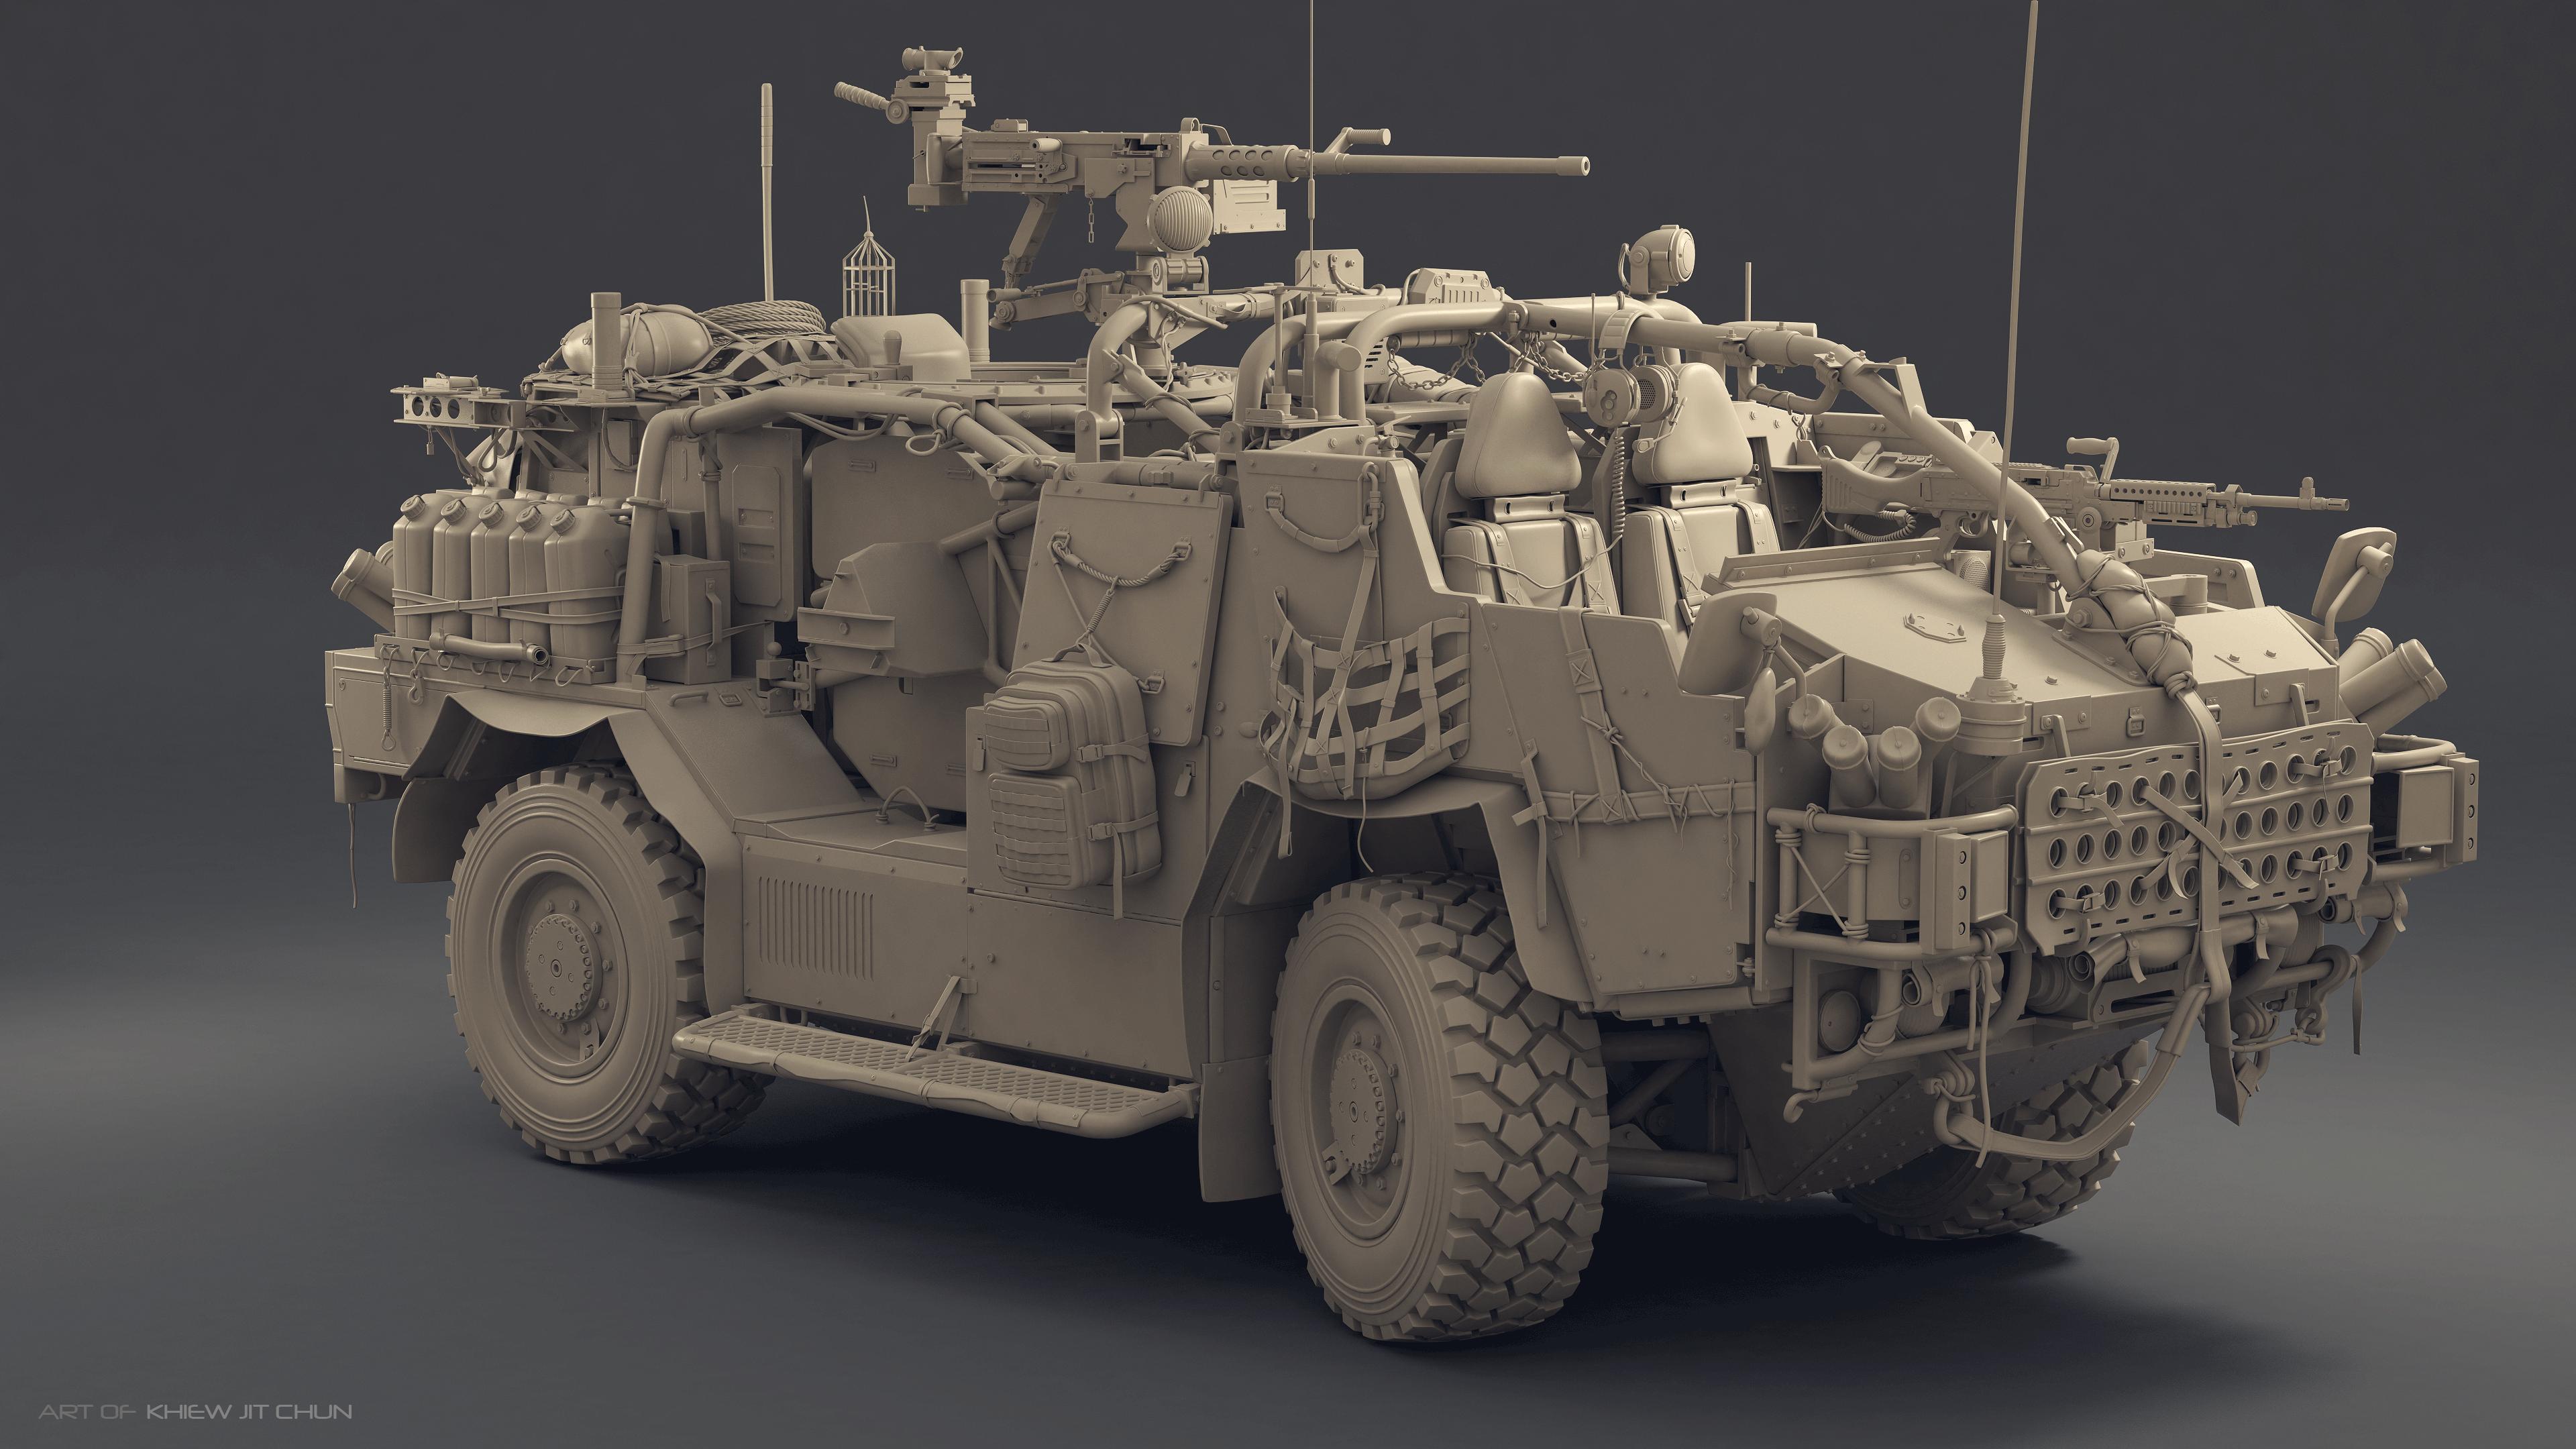 Jackal Military Vehicle